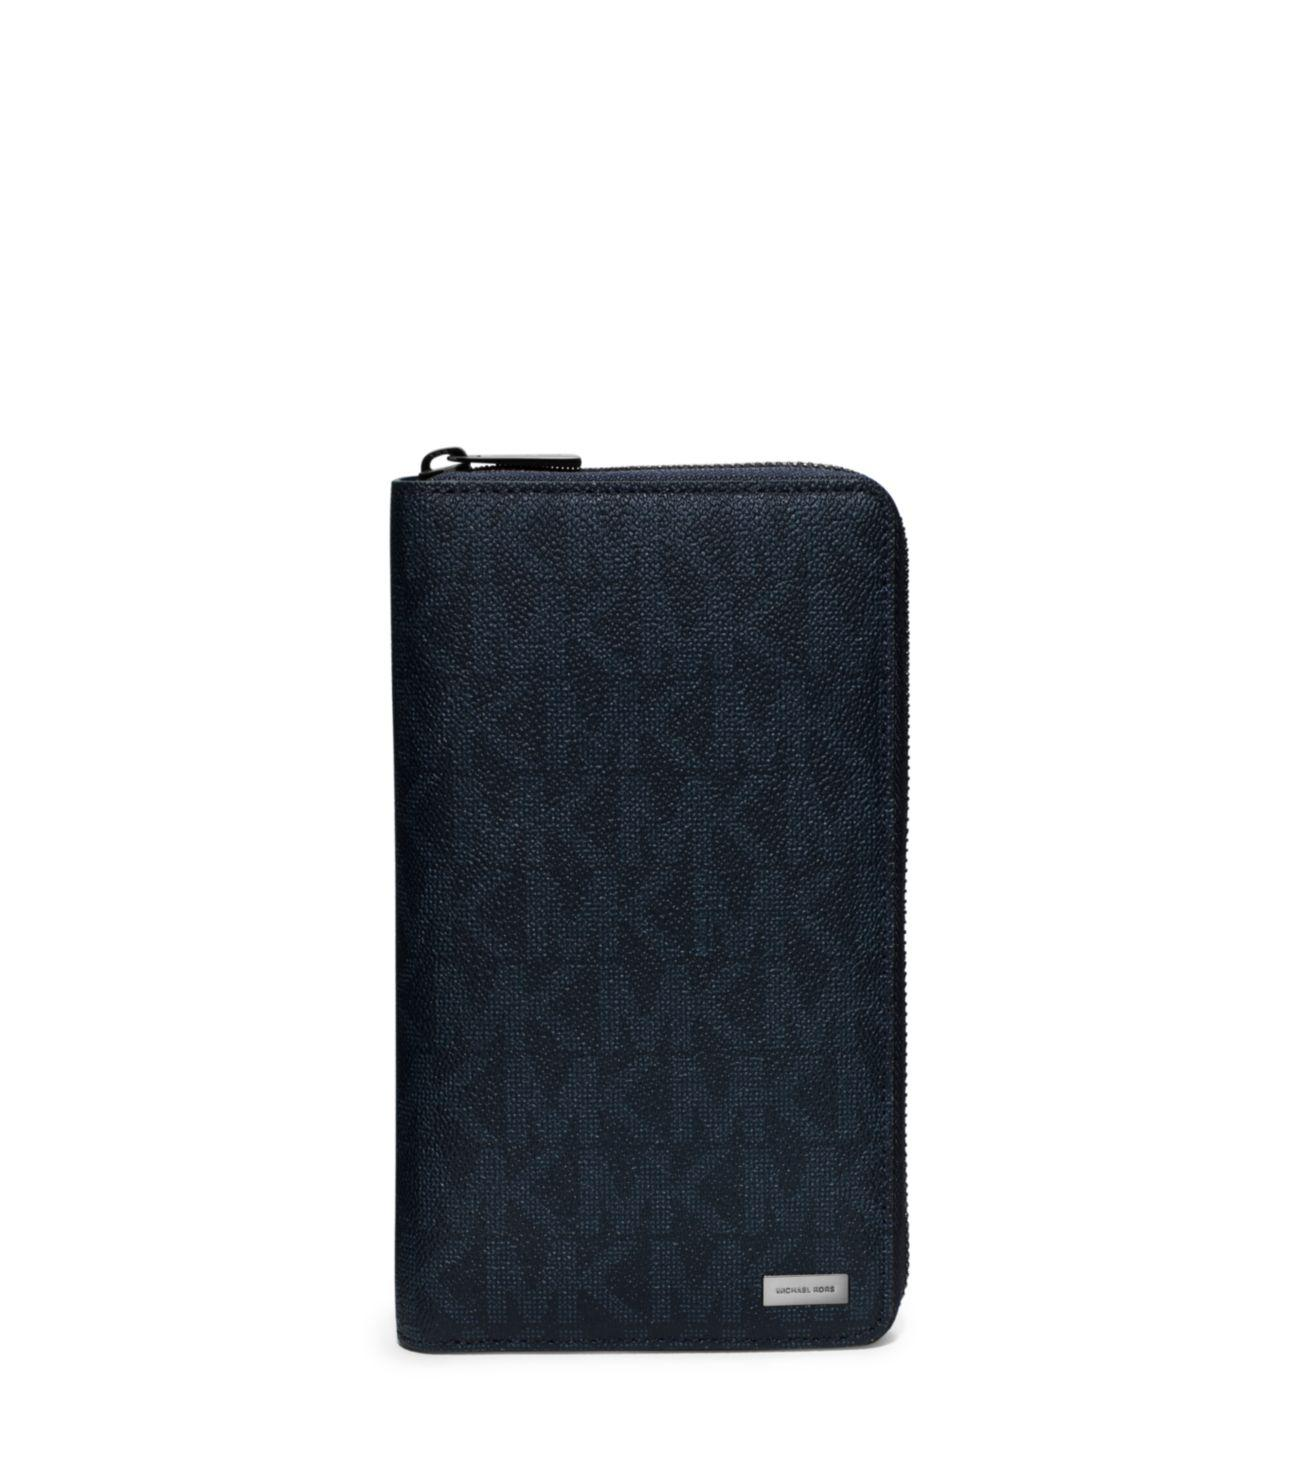 Michael Kors Jet Set Logo Zip Around Travel Wallet In Blue